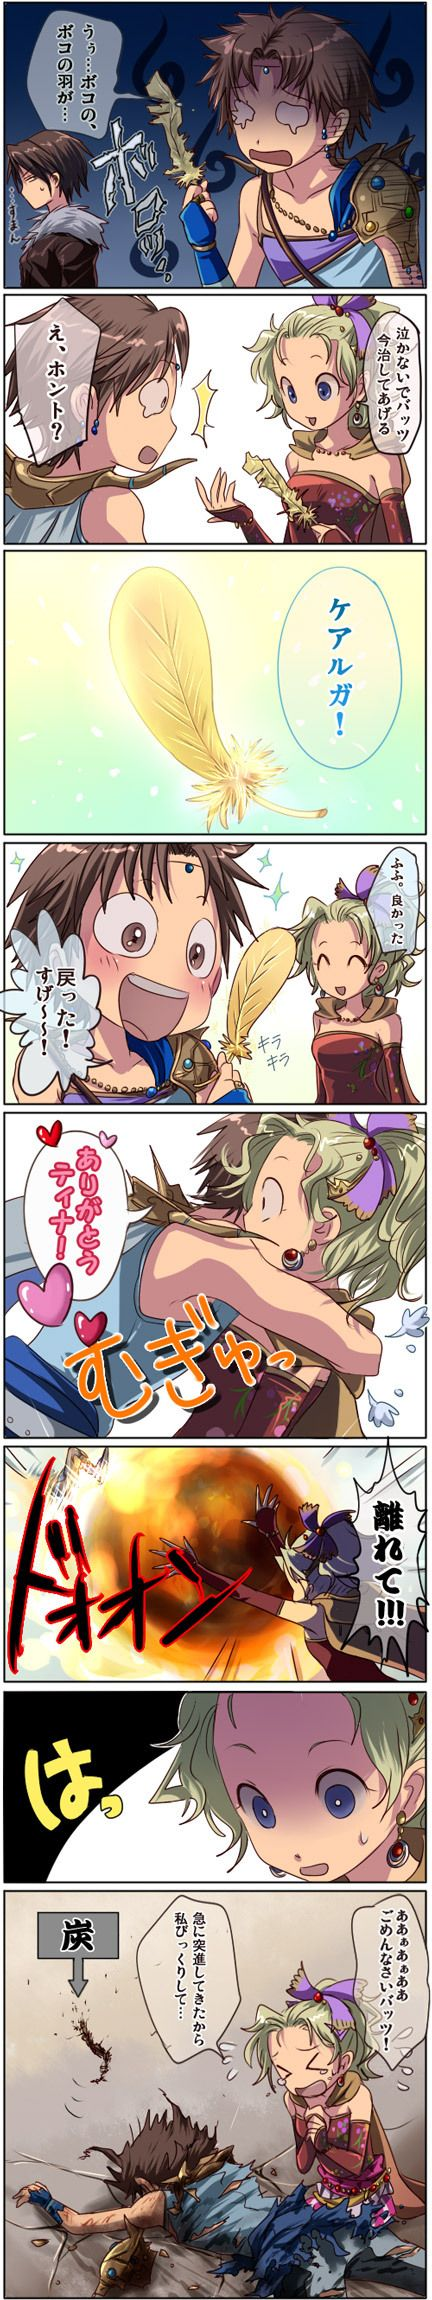 Final Fantasy - Squall (Final Fantasy 8), Terra (Final Fantasy 6), Bartz/Butz (Final Fantasy 5)